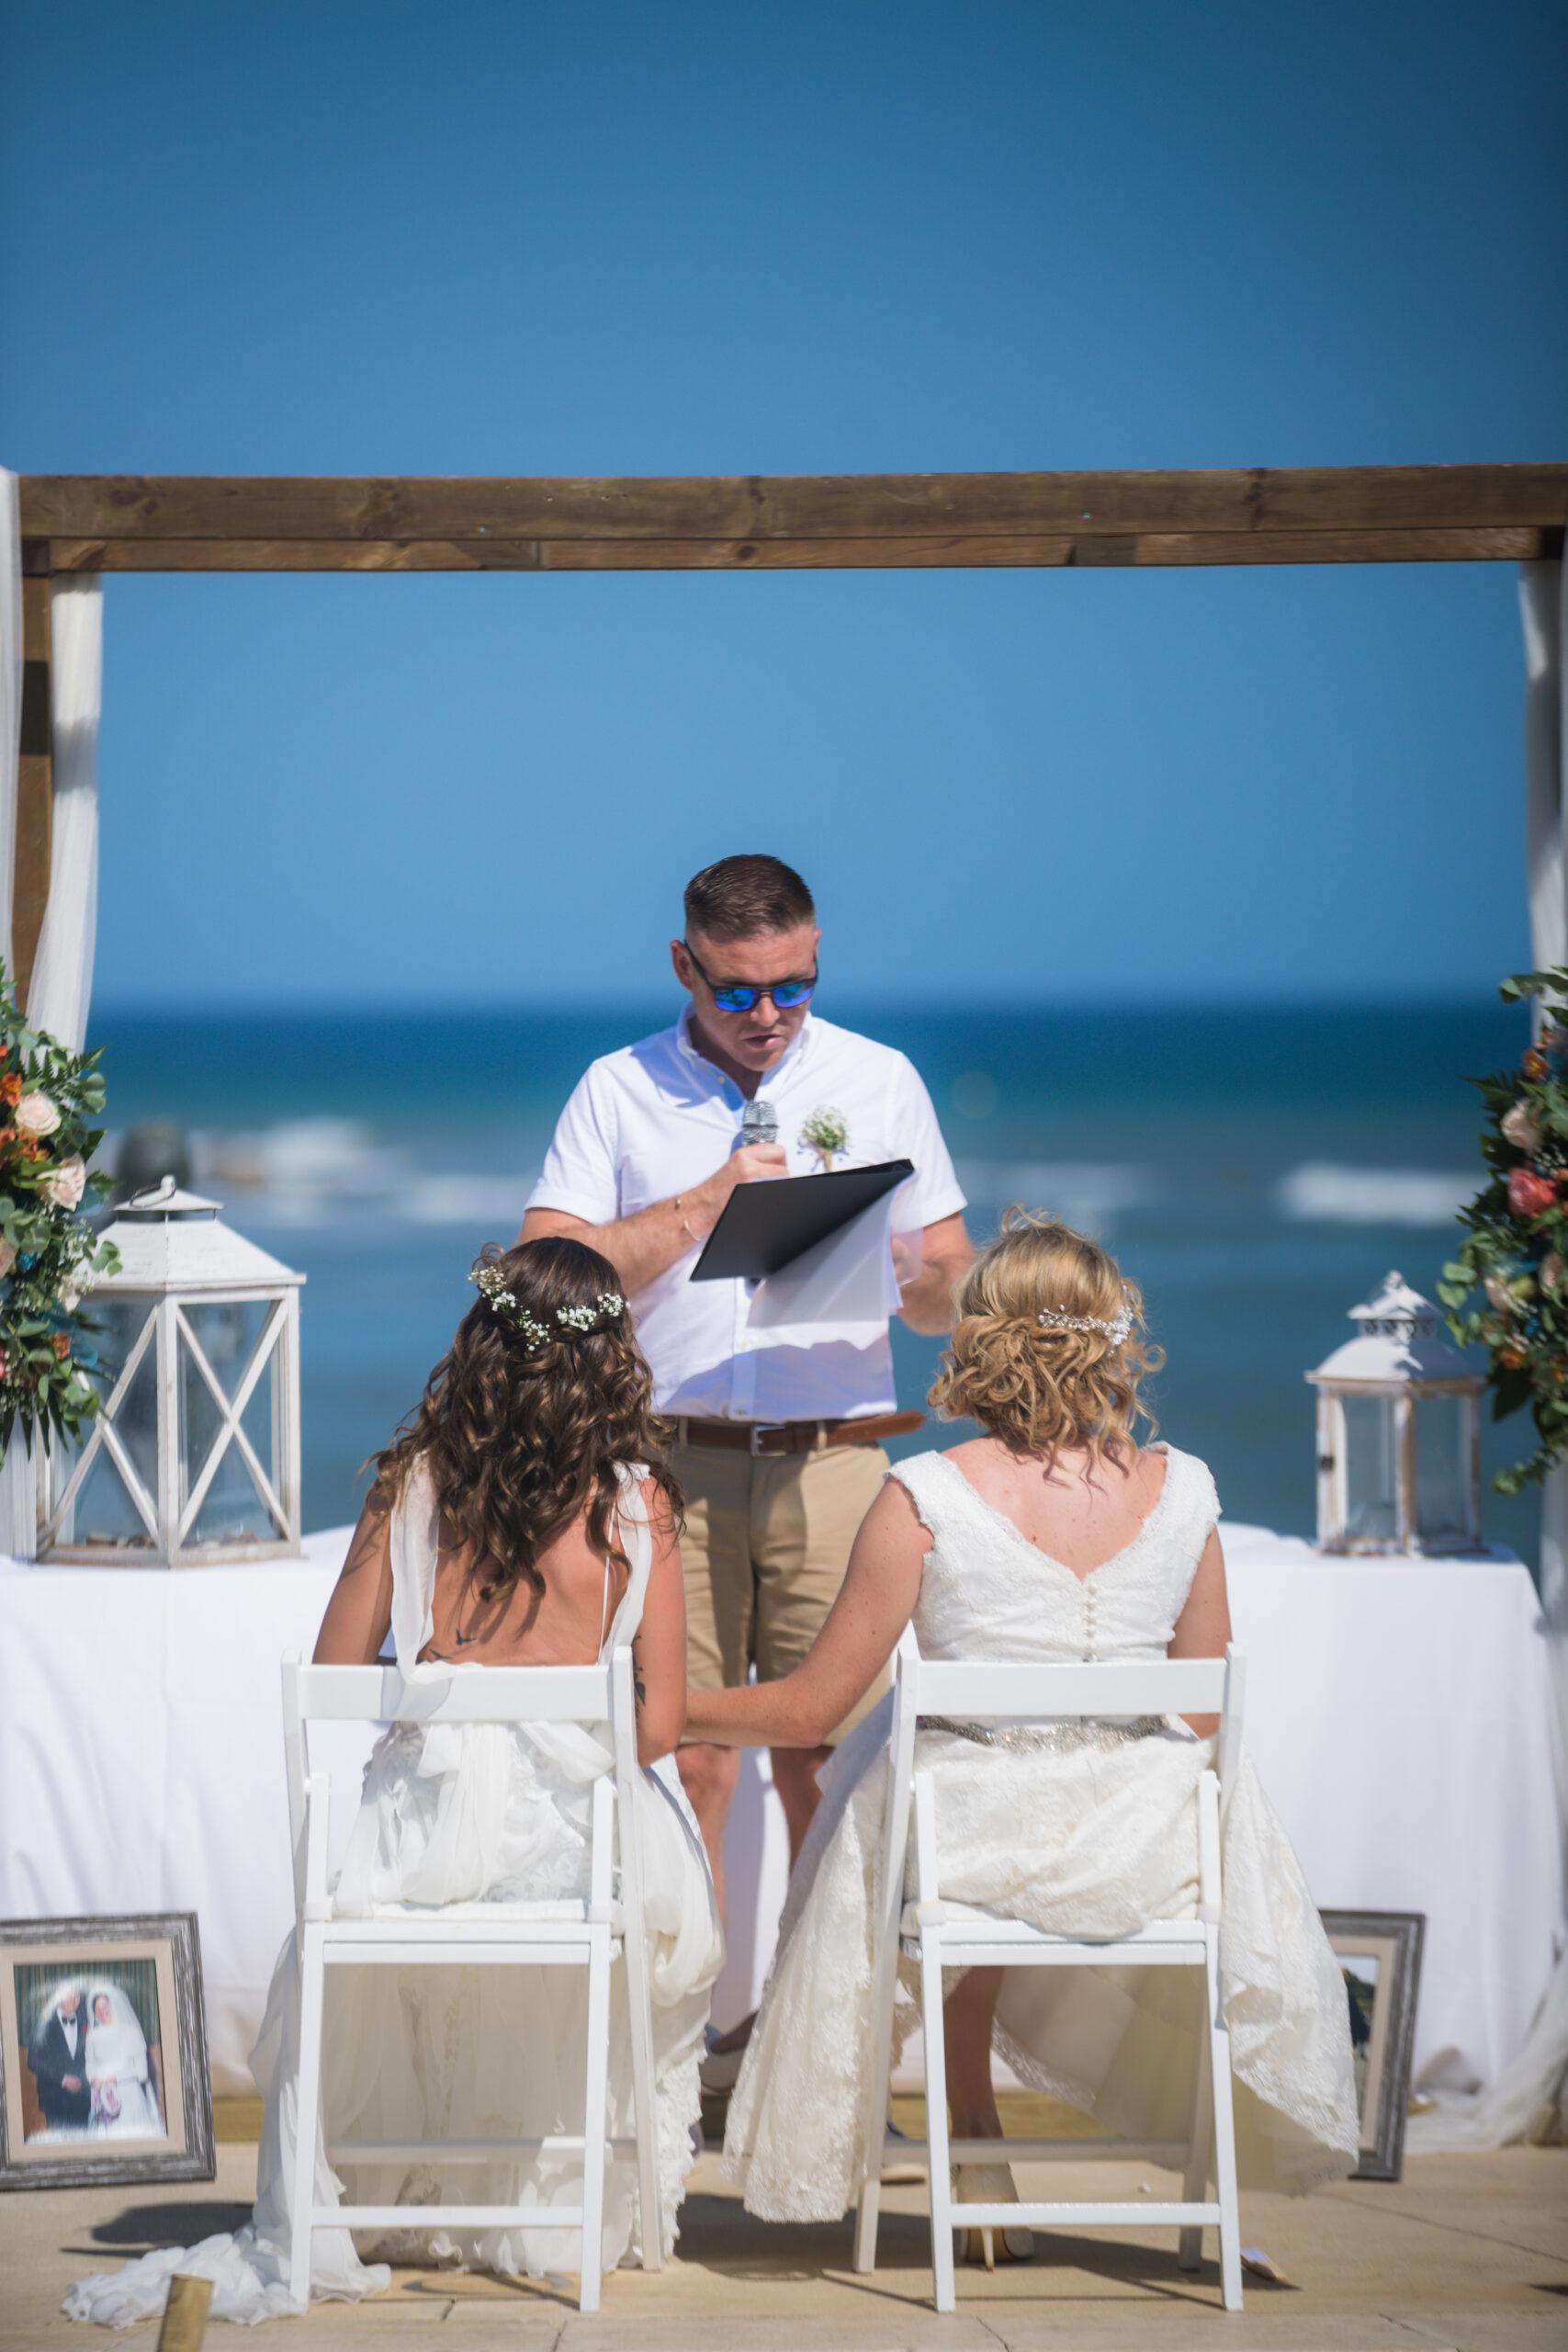 The beautiful wedding ceremony - Rebecca Davidson Photography